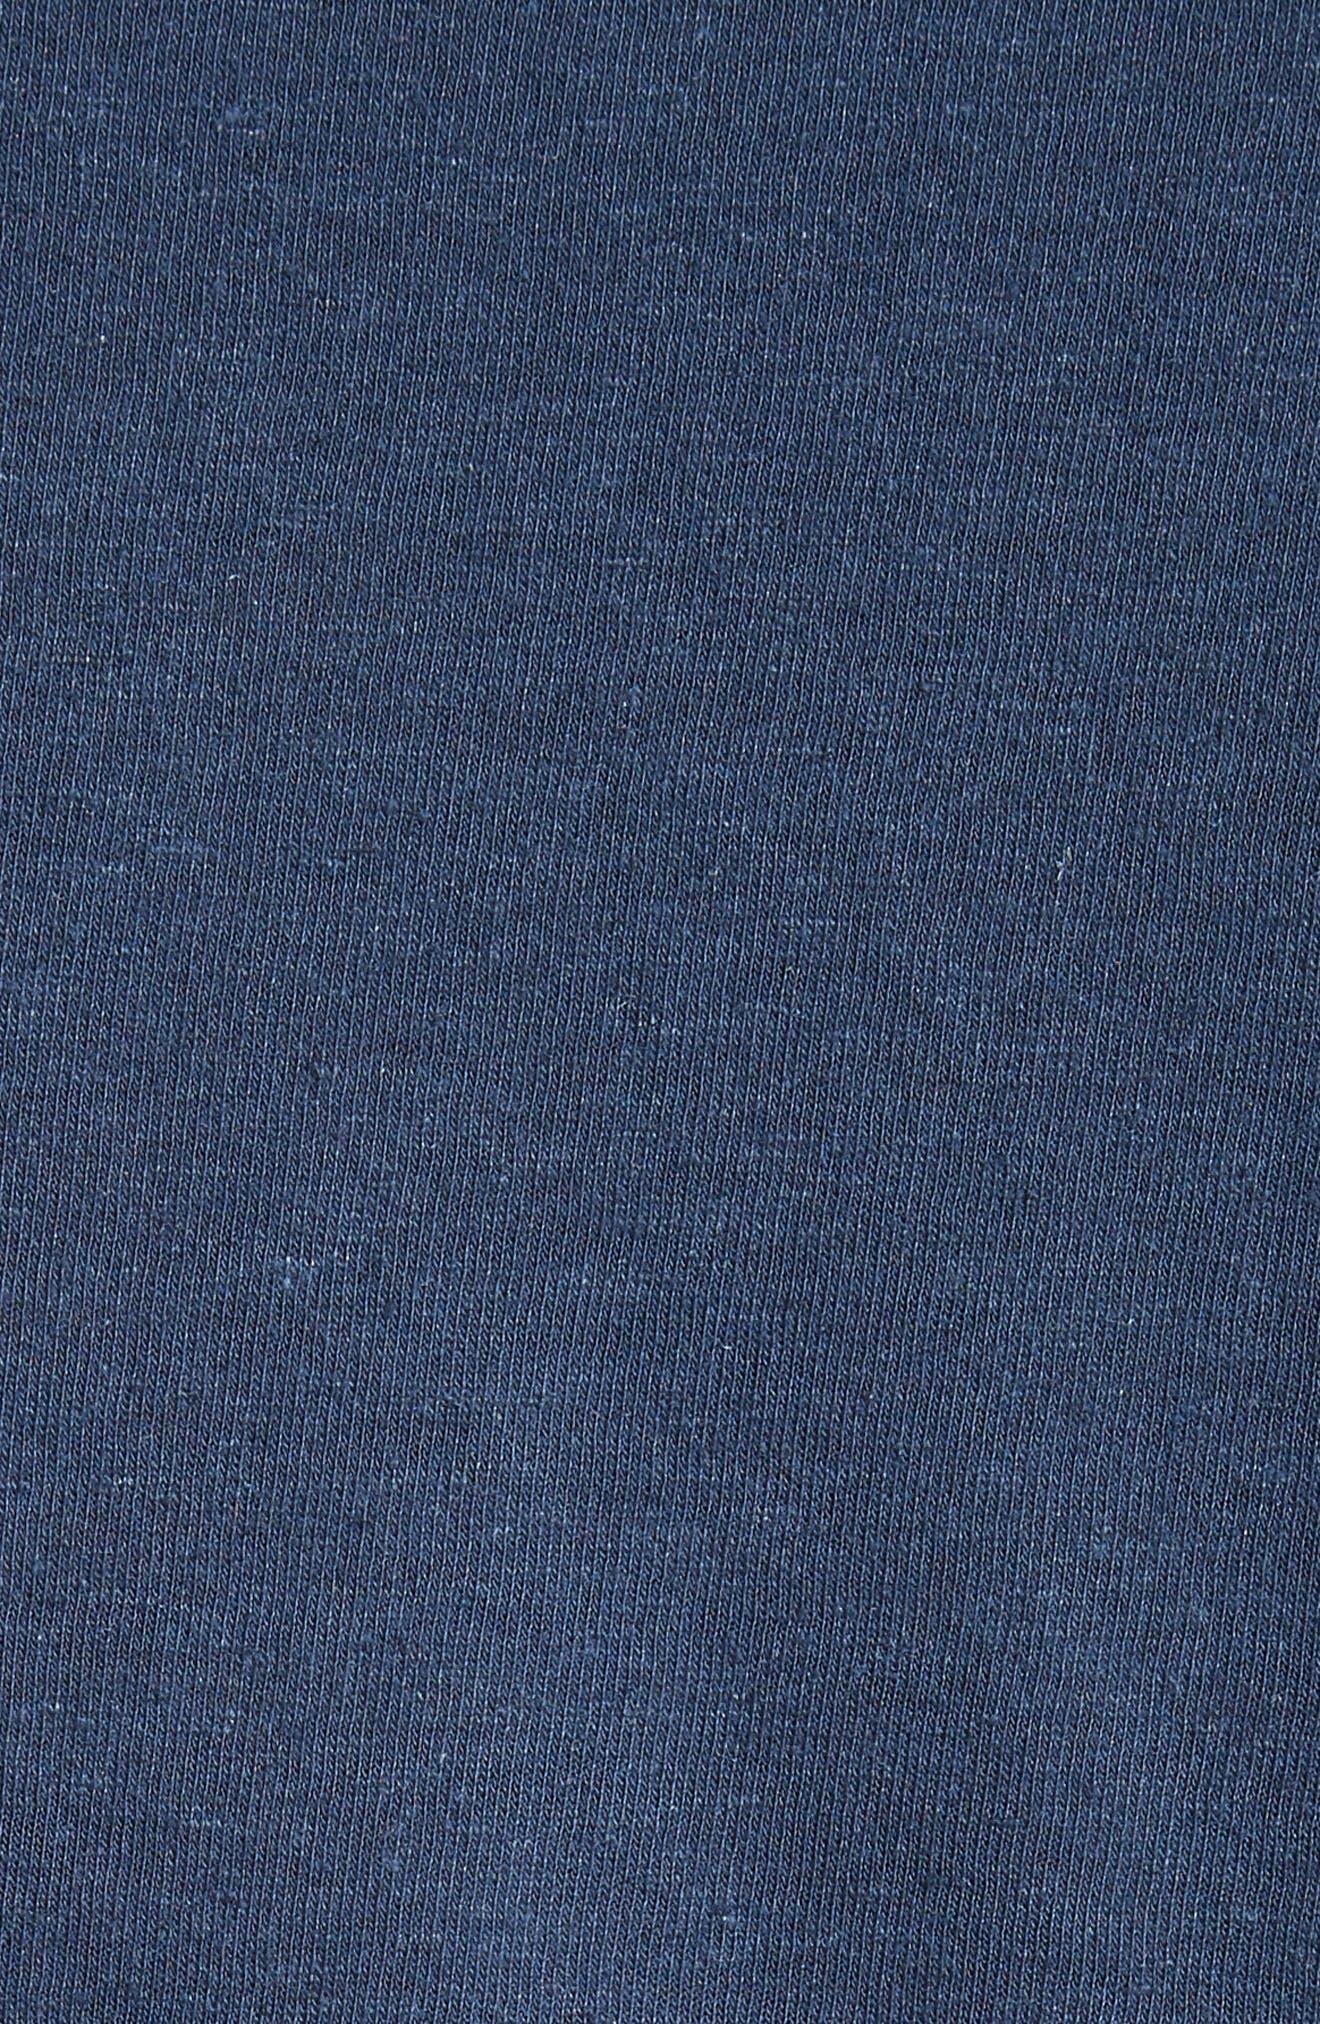 Alternate Image 5  - ONIA Chad Linen Blend Pocket T-Shirt